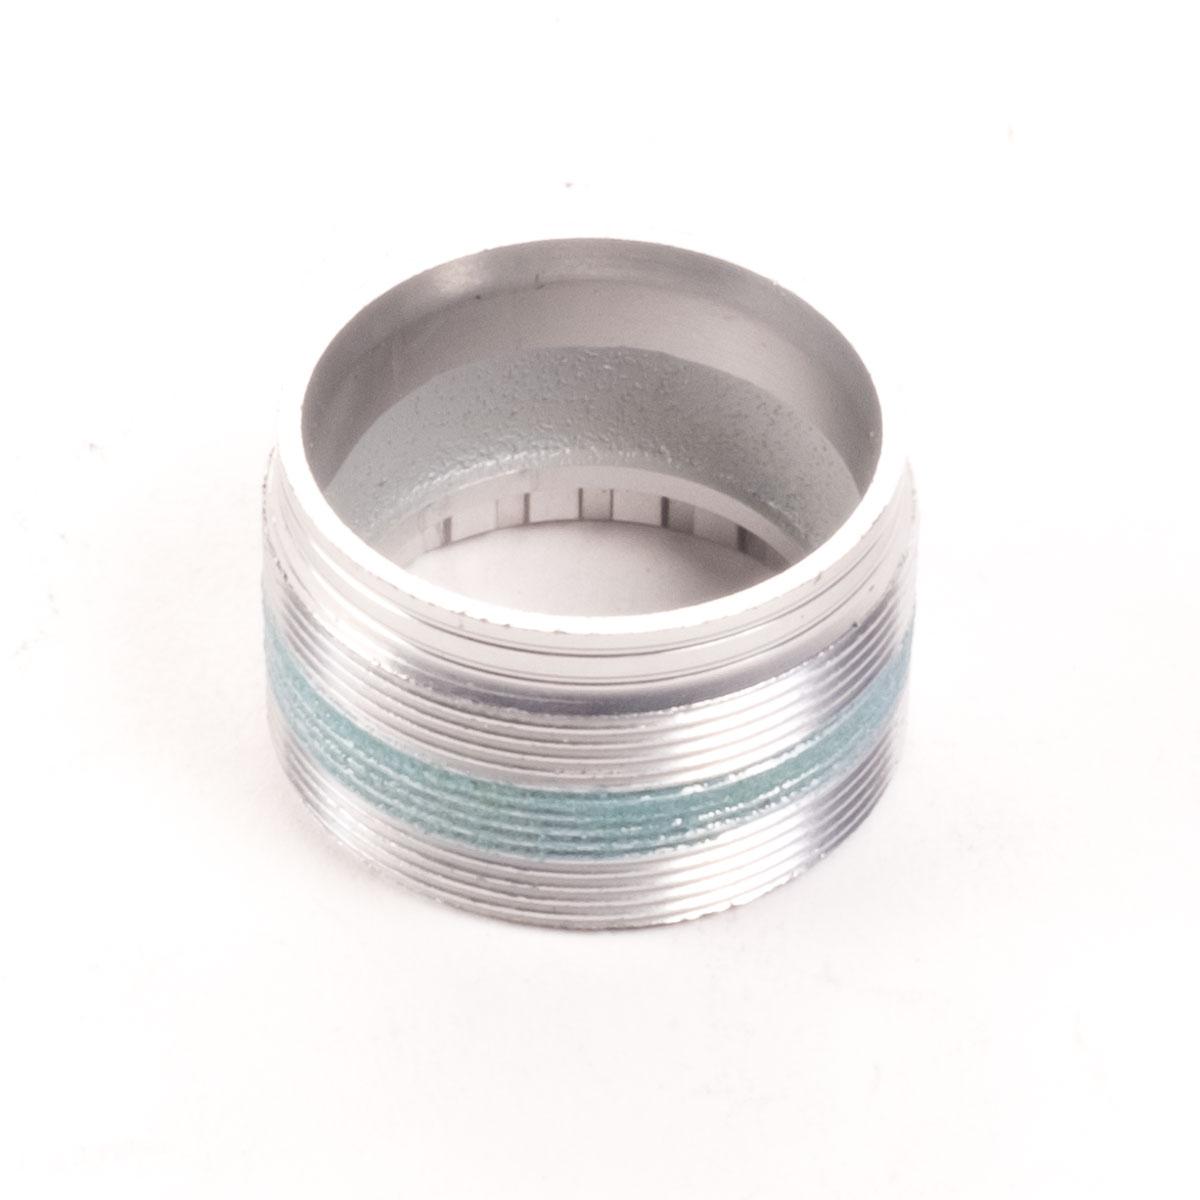 Shimano XTR Bottom Bracket Left Adapter Octalink V1 Pack of 5 Silver